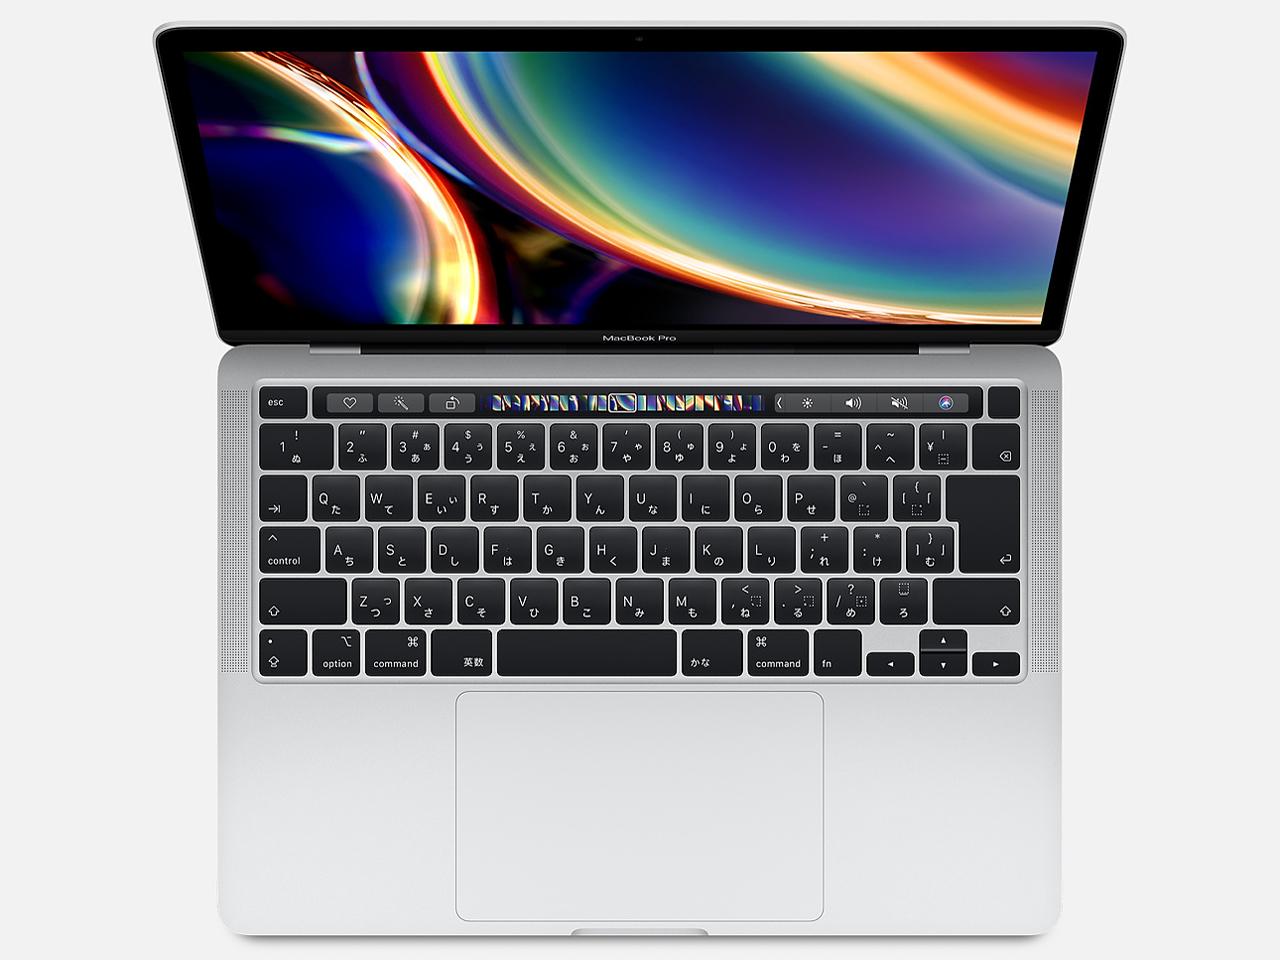 MacBook Pro Retinaディスプレイ 2000/13.3 MWP42J/A [スペースグレイ]